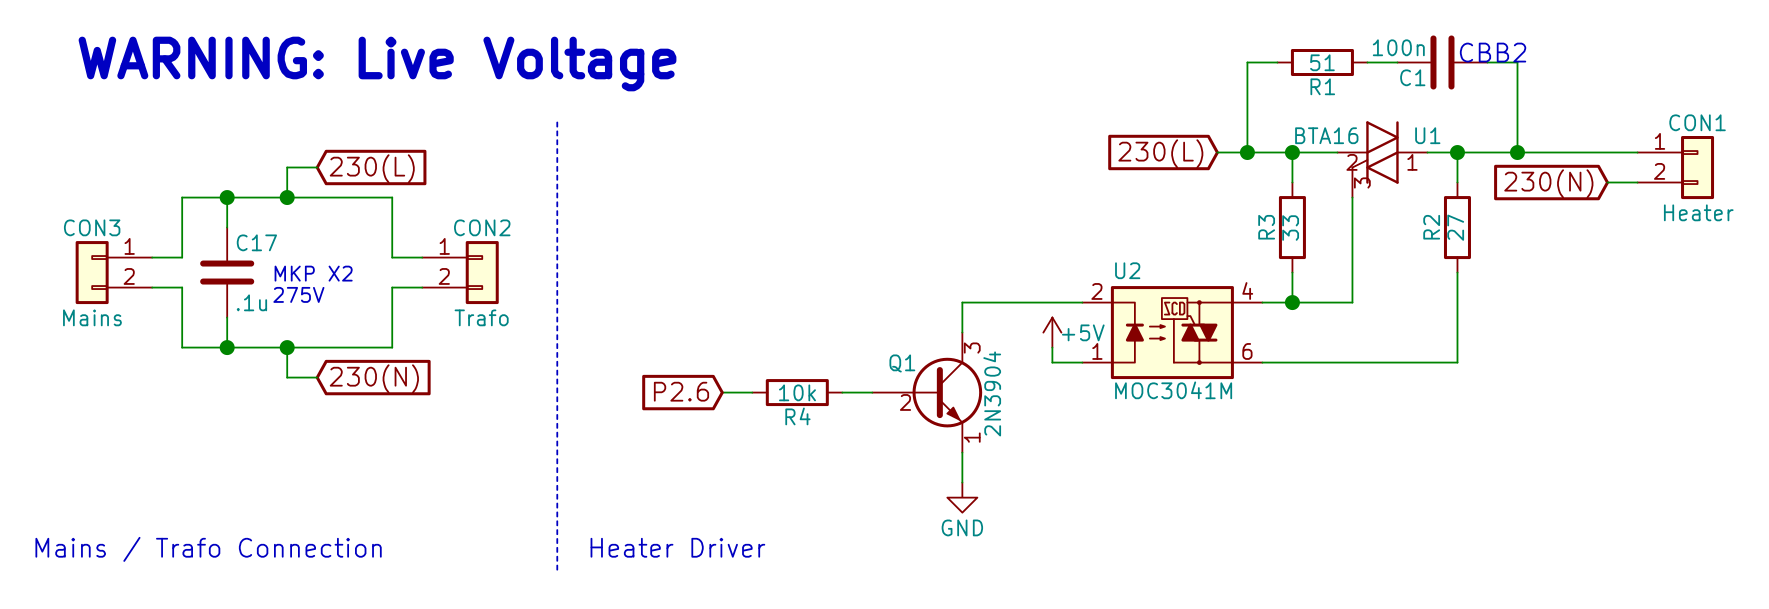 How To Build Fancontrol Circuit Diagram